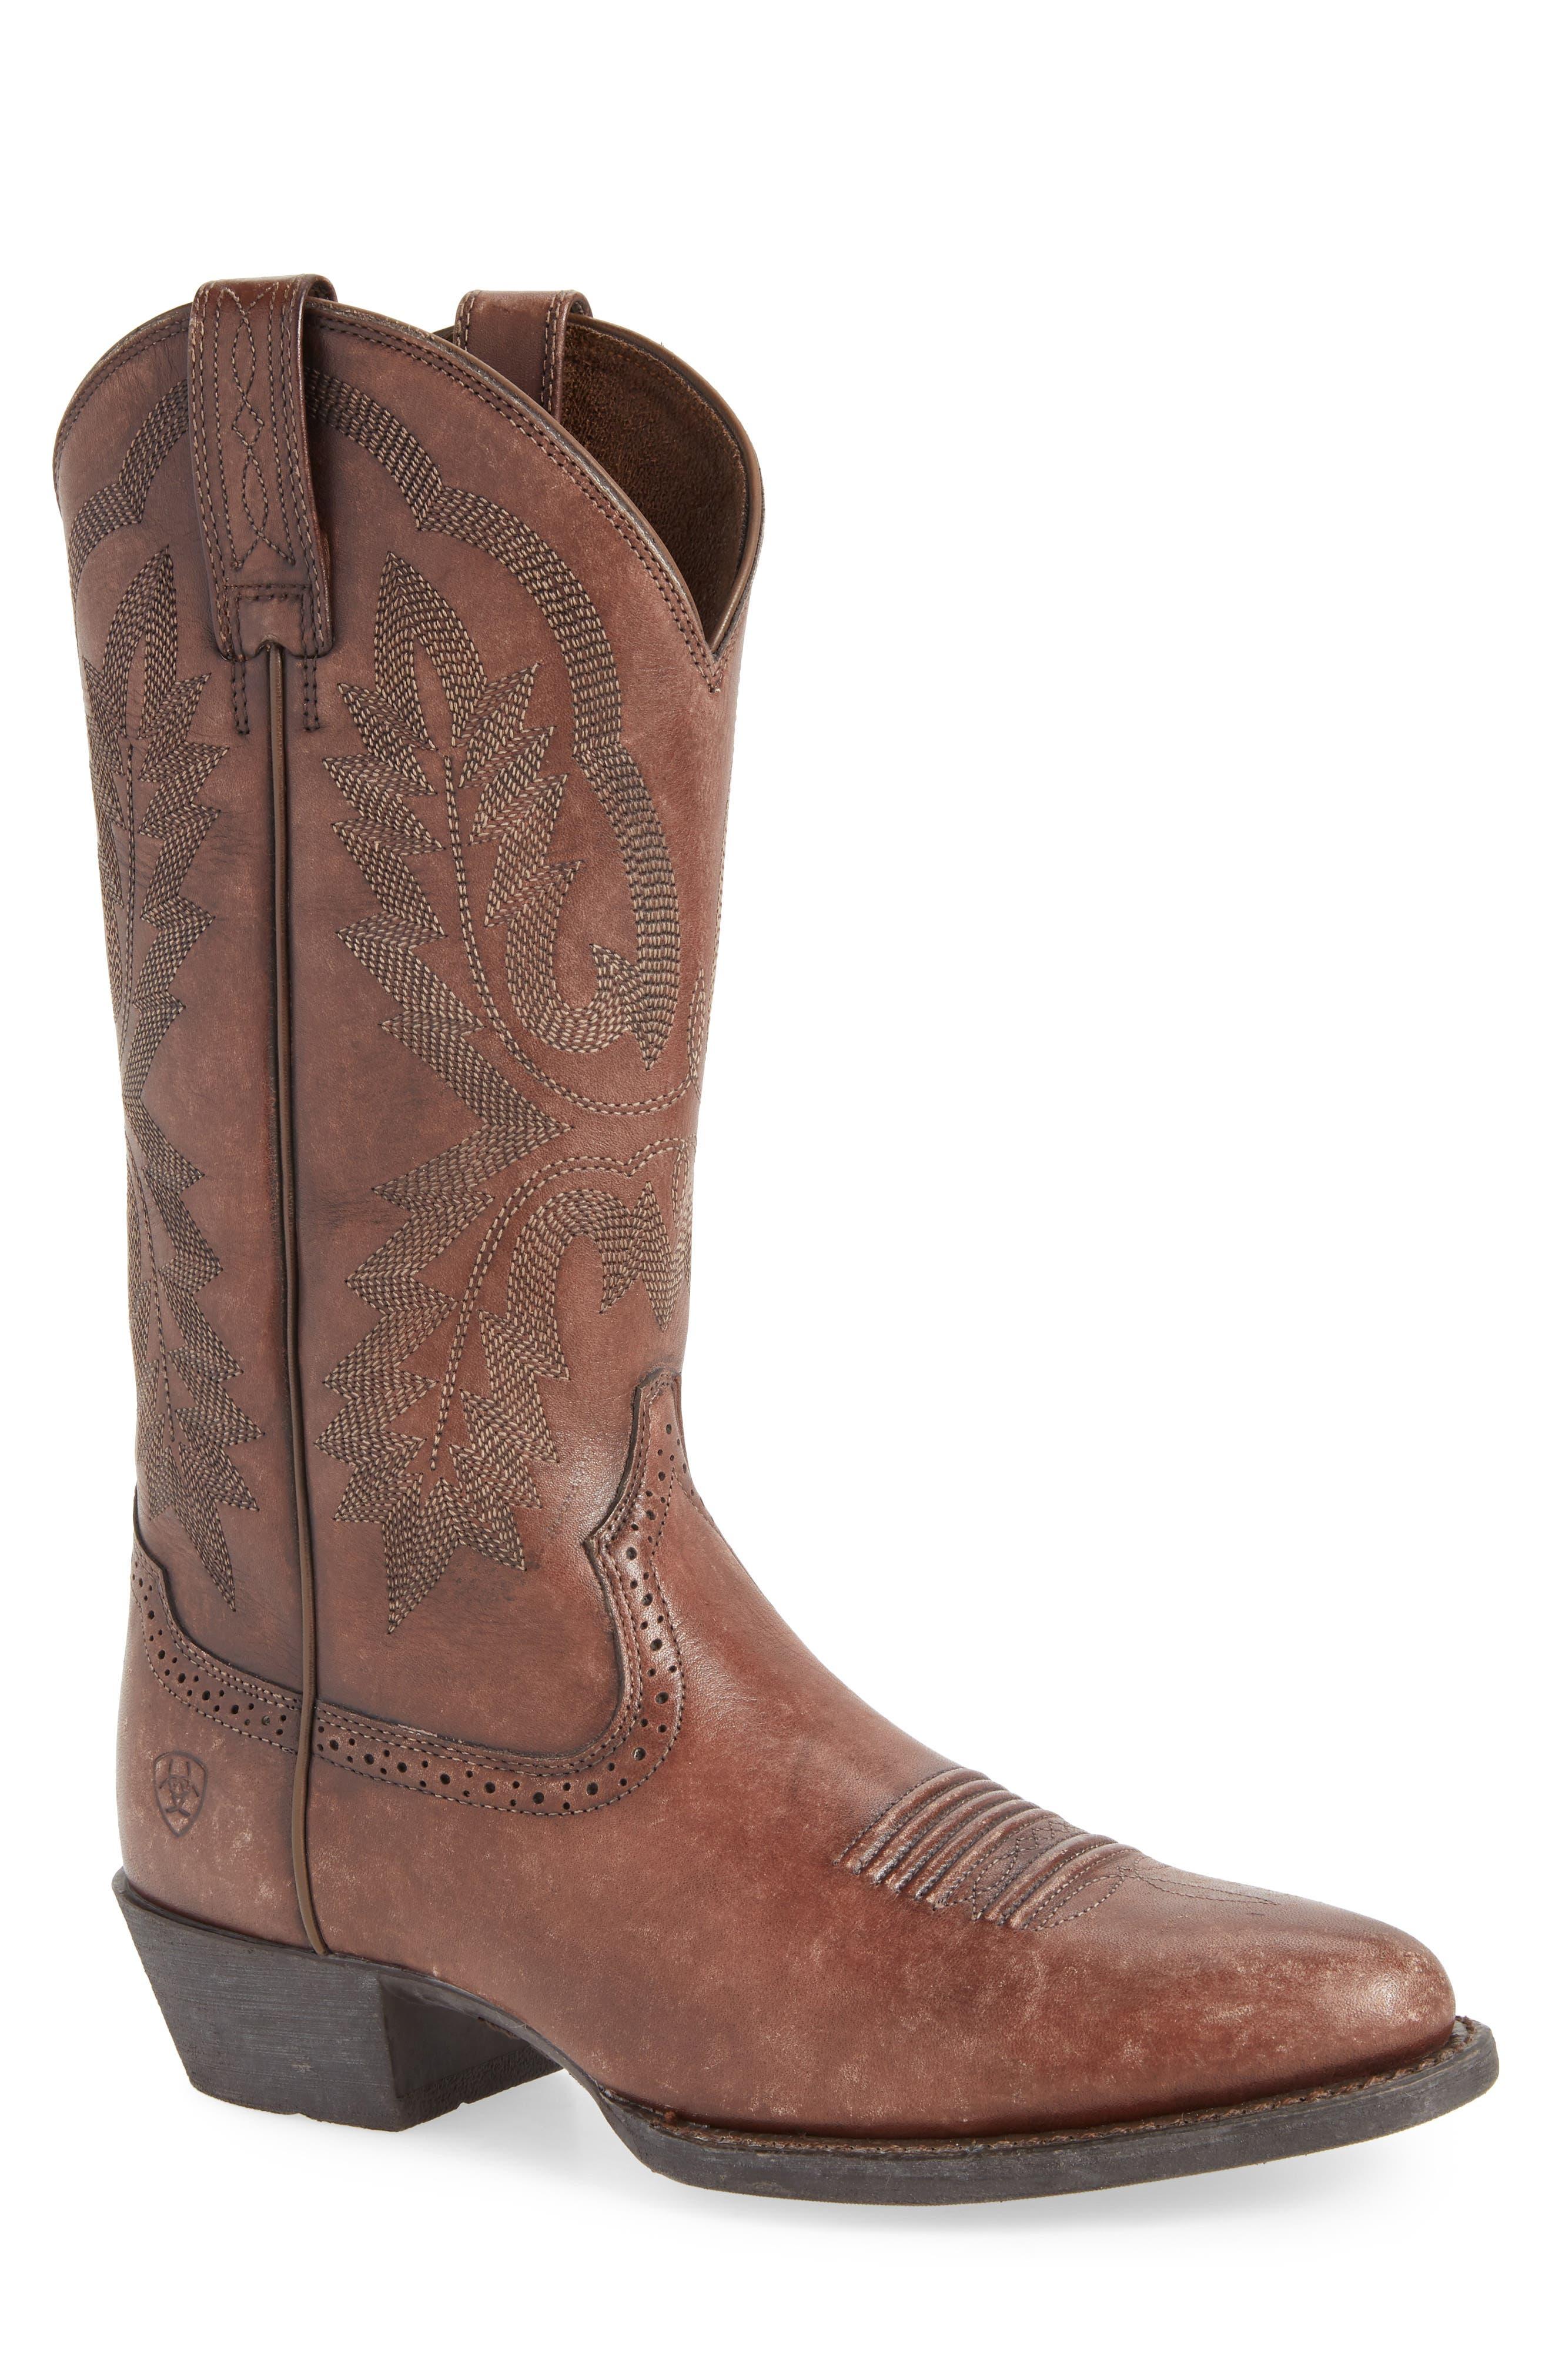 Ariat Heritage Calhoun Western R-Toe Boot, Brown